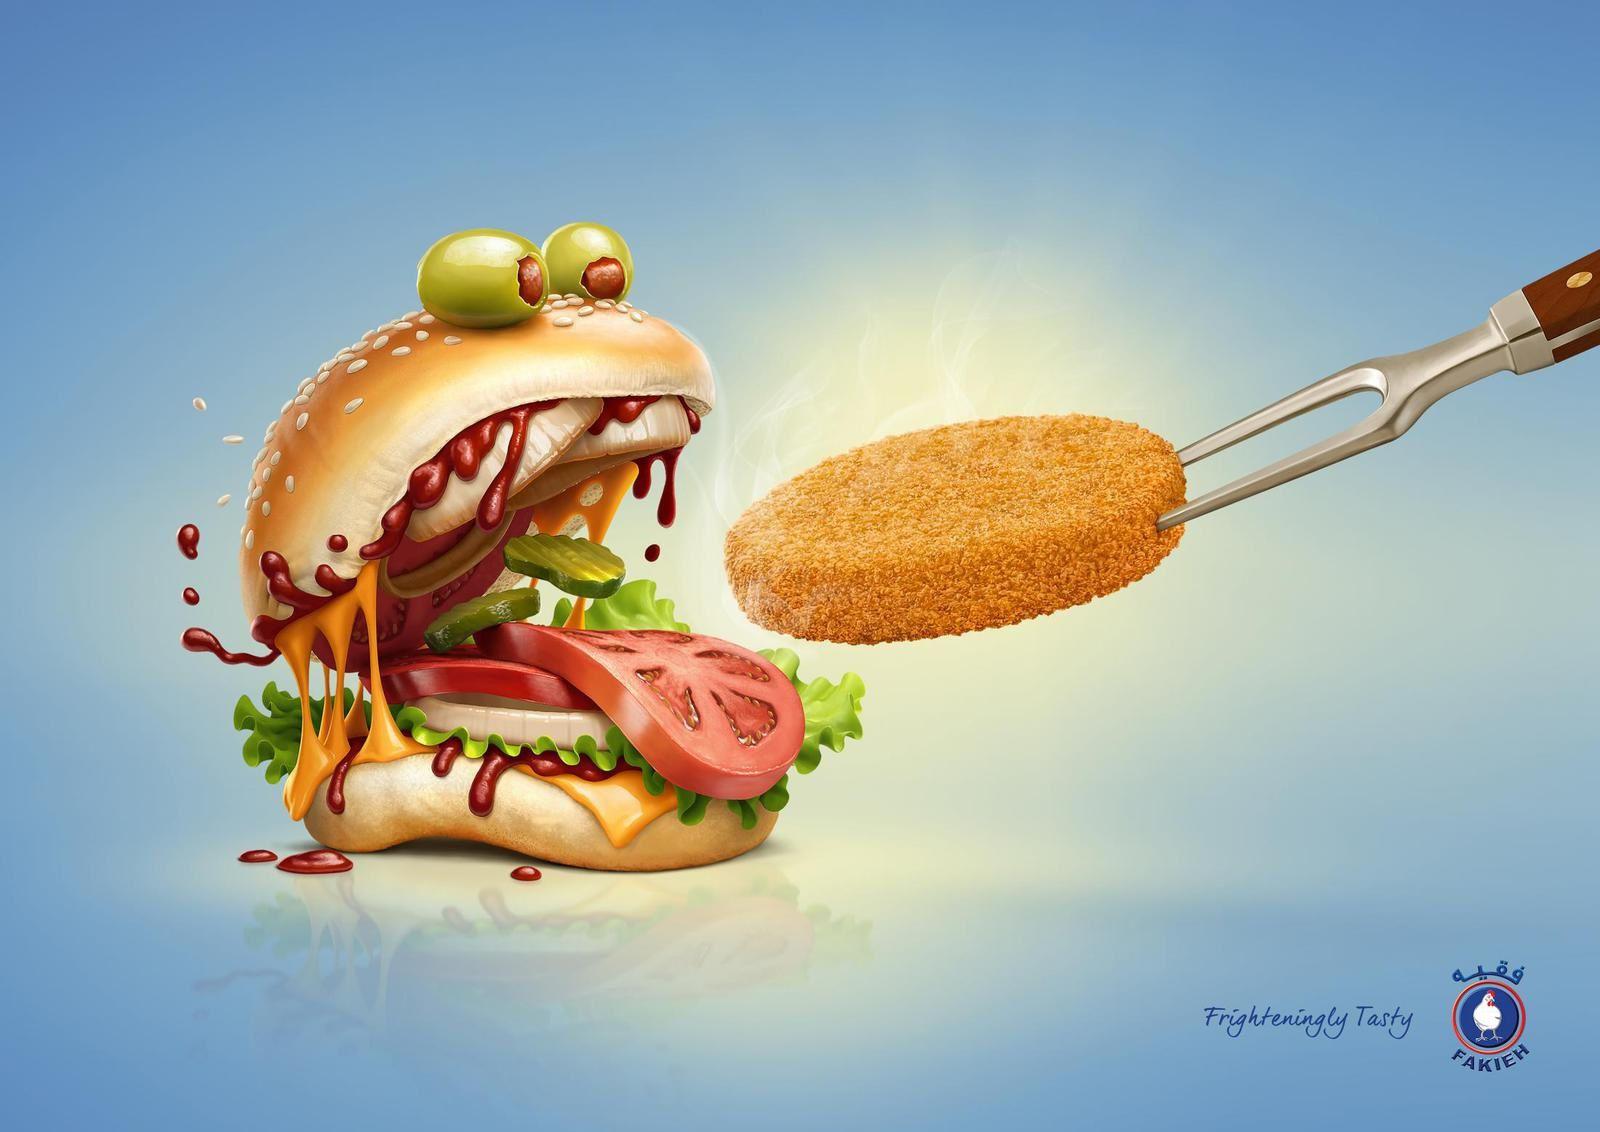 """Frightreningly tasty"" - Fakieh Chicken I Agence : Buheis Creative, Jeddah, Arabie Saoudite (octobre 2016)"